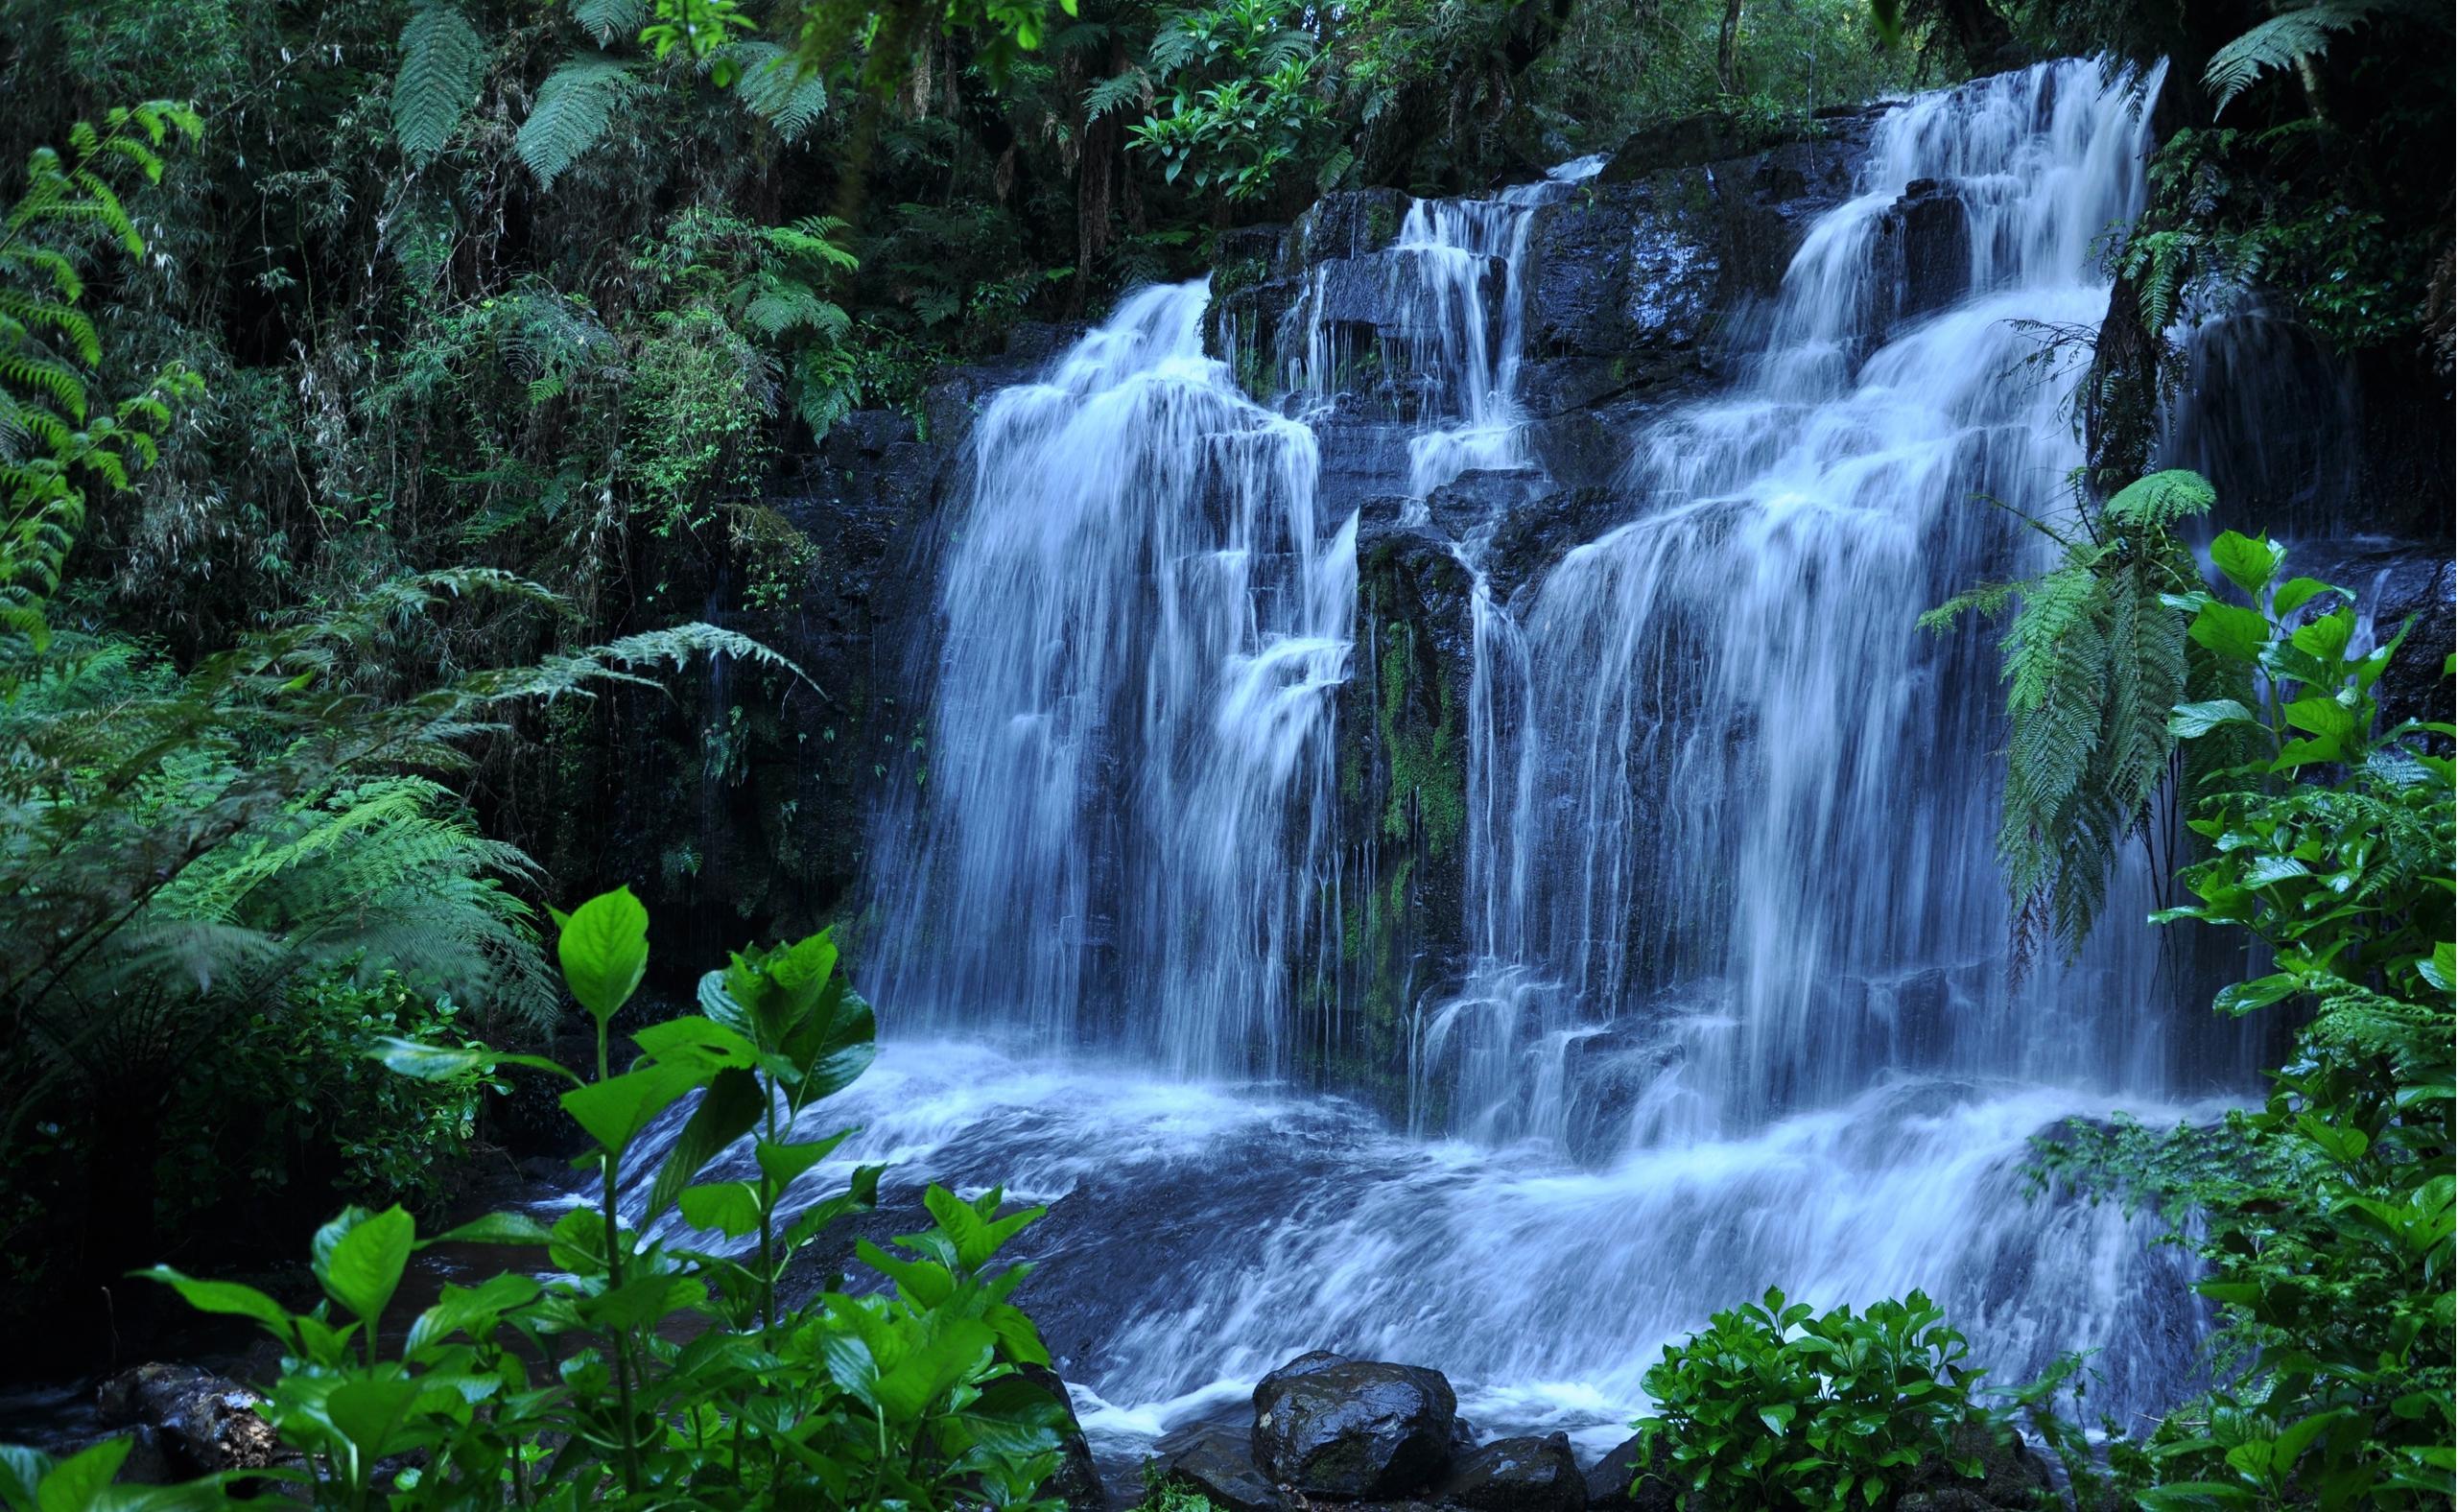 Wallpaper Of Beautiful Scenes Of Nature Nature Scenes Wallpaper …